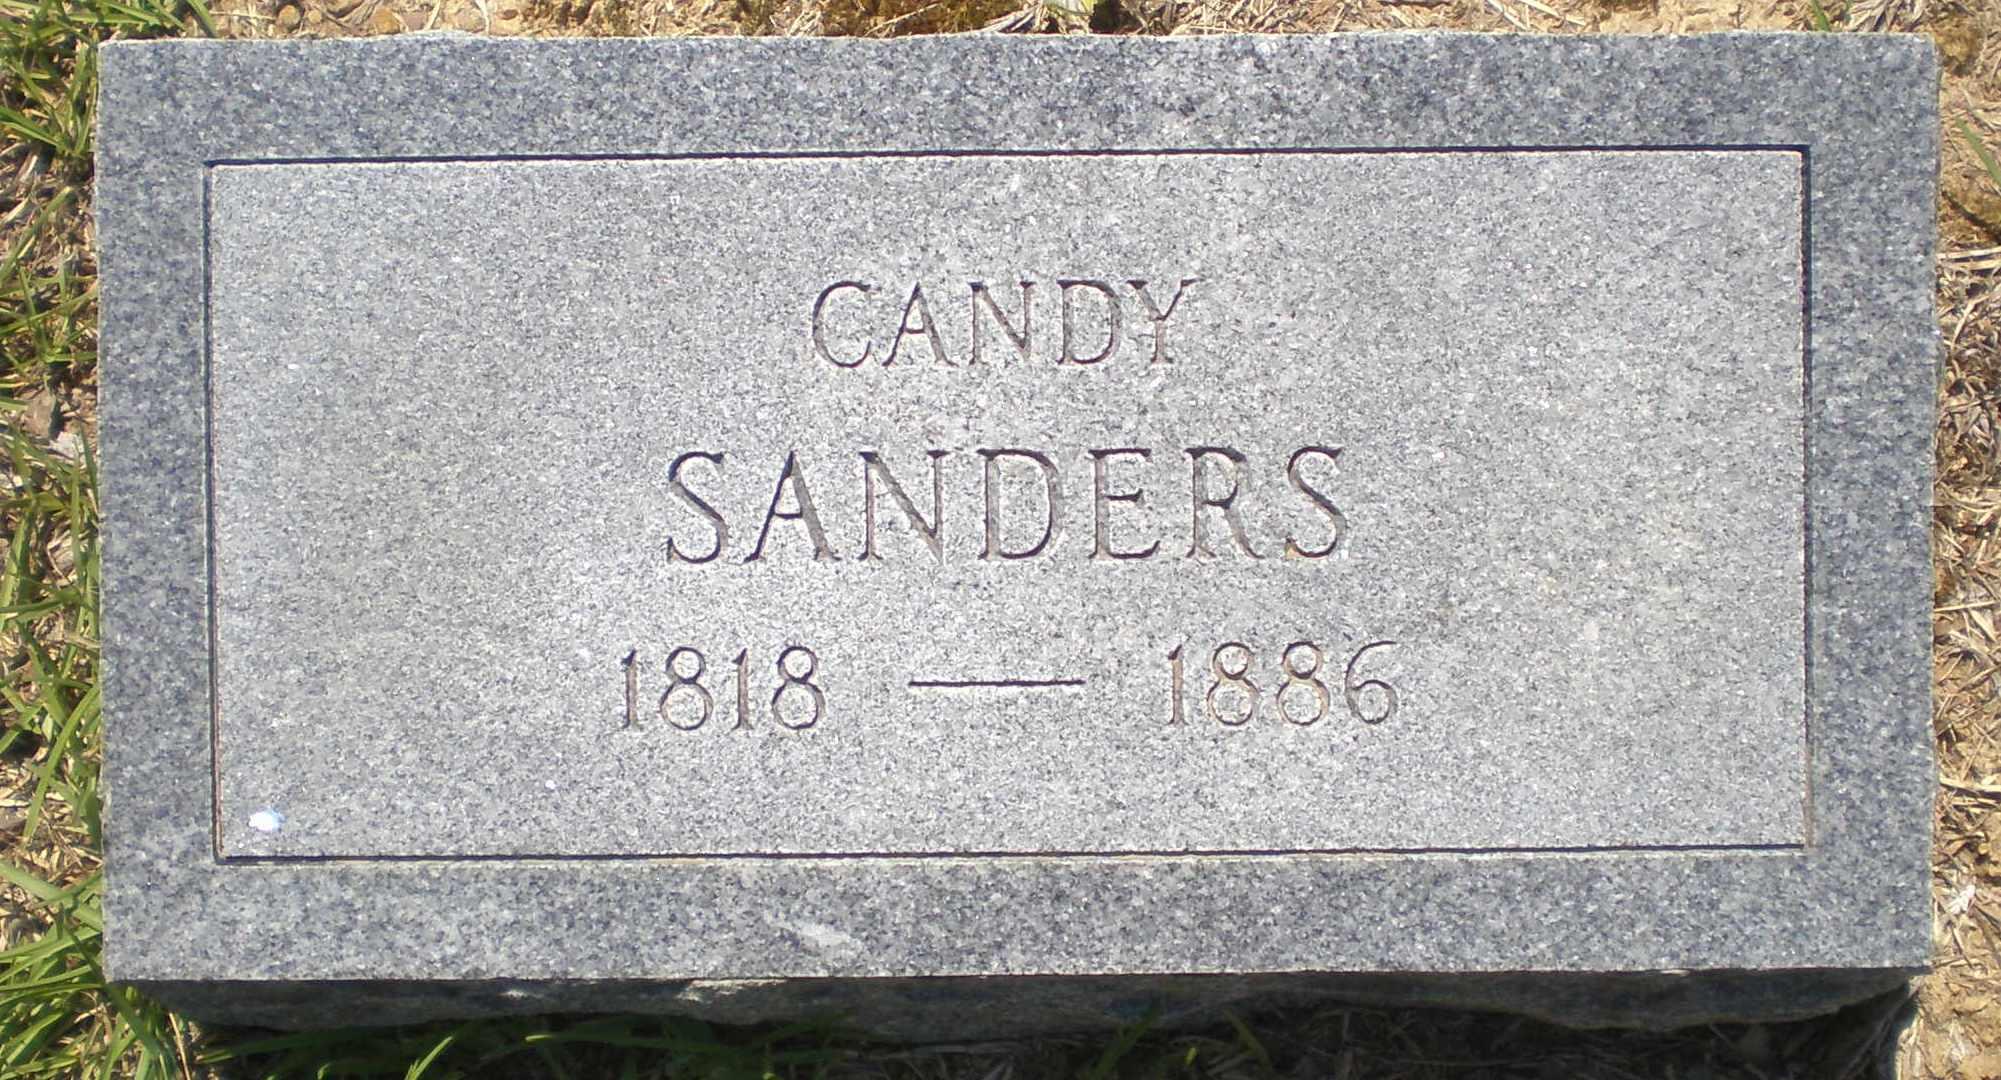 David M Sanders